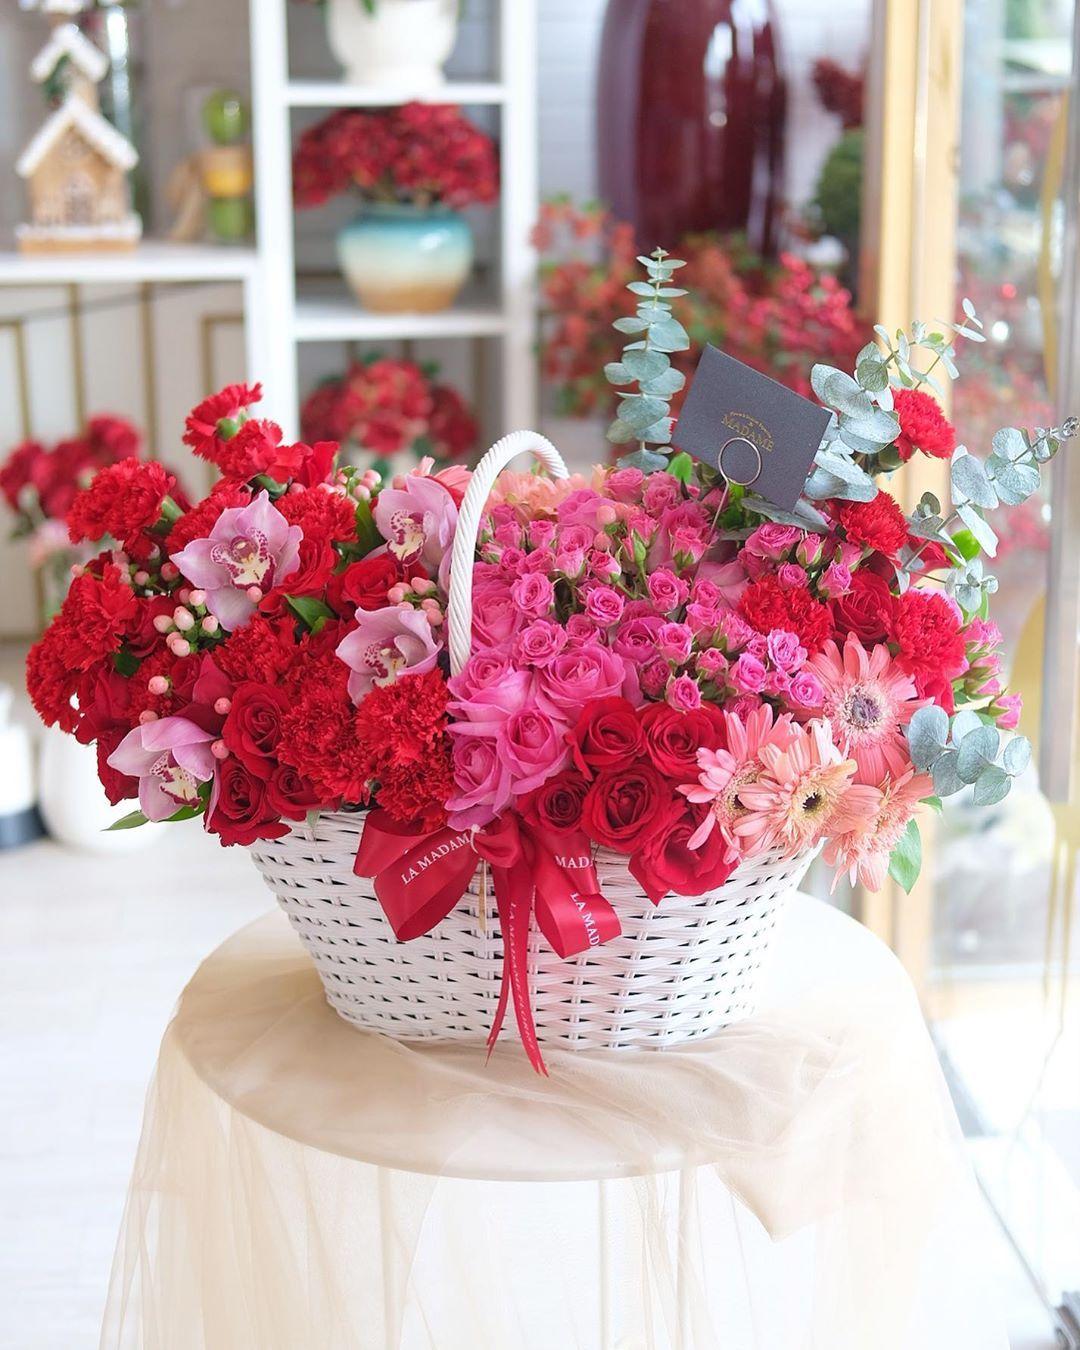 7 Florist Jakarta Dengan Buket Mewah Yang Pas Untuk Hadiah Valentine